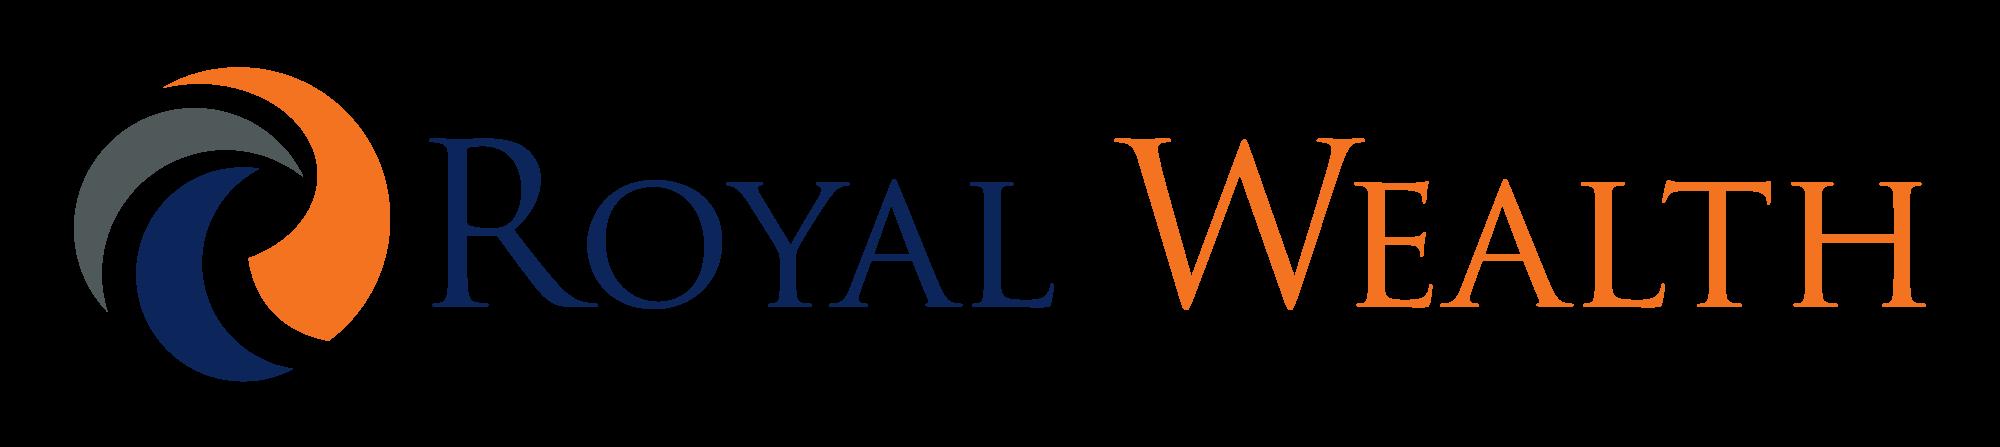 RoyalWealth